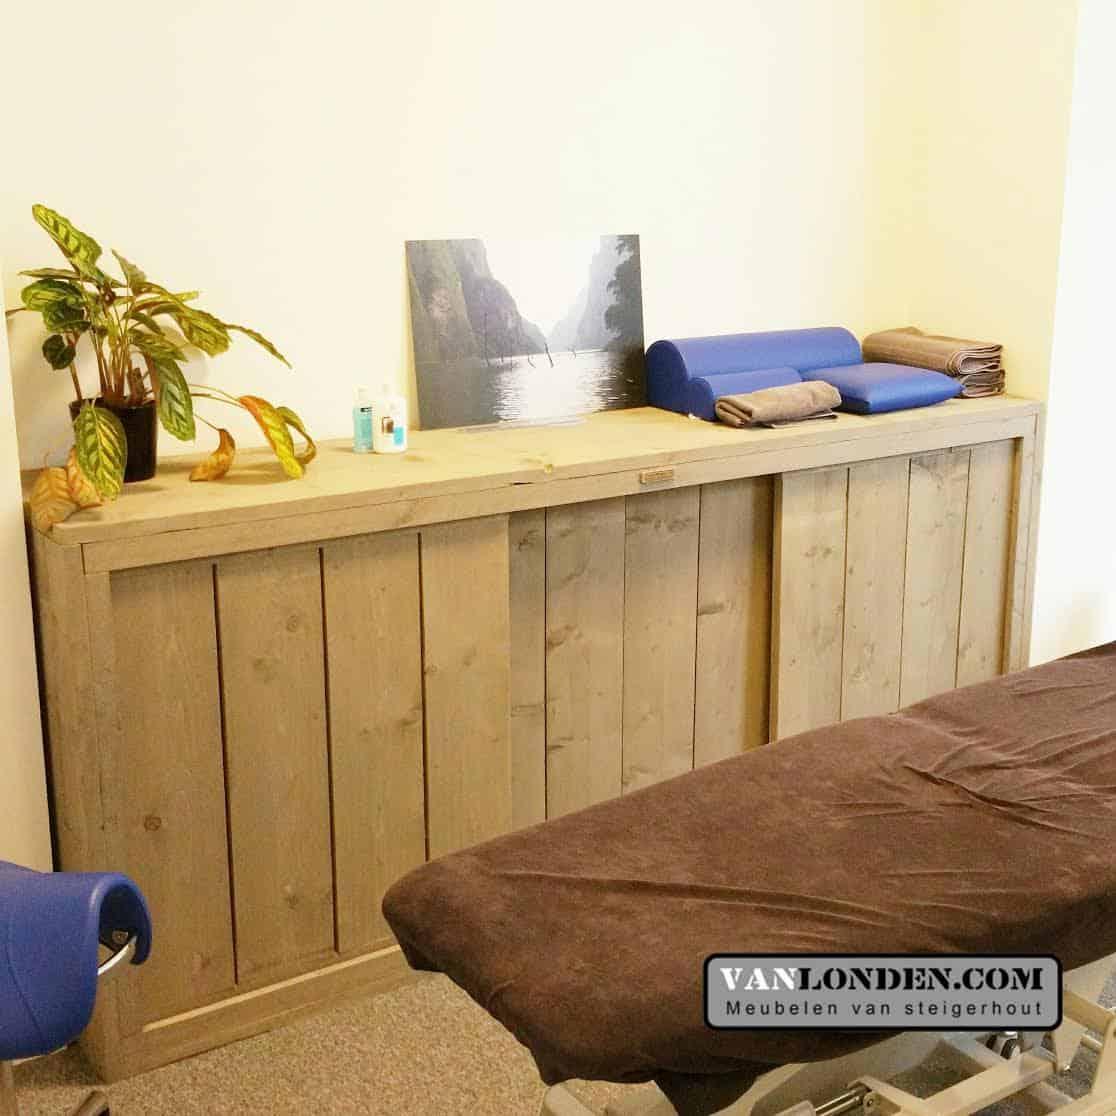 Vanlonden steigerhouten meubelen